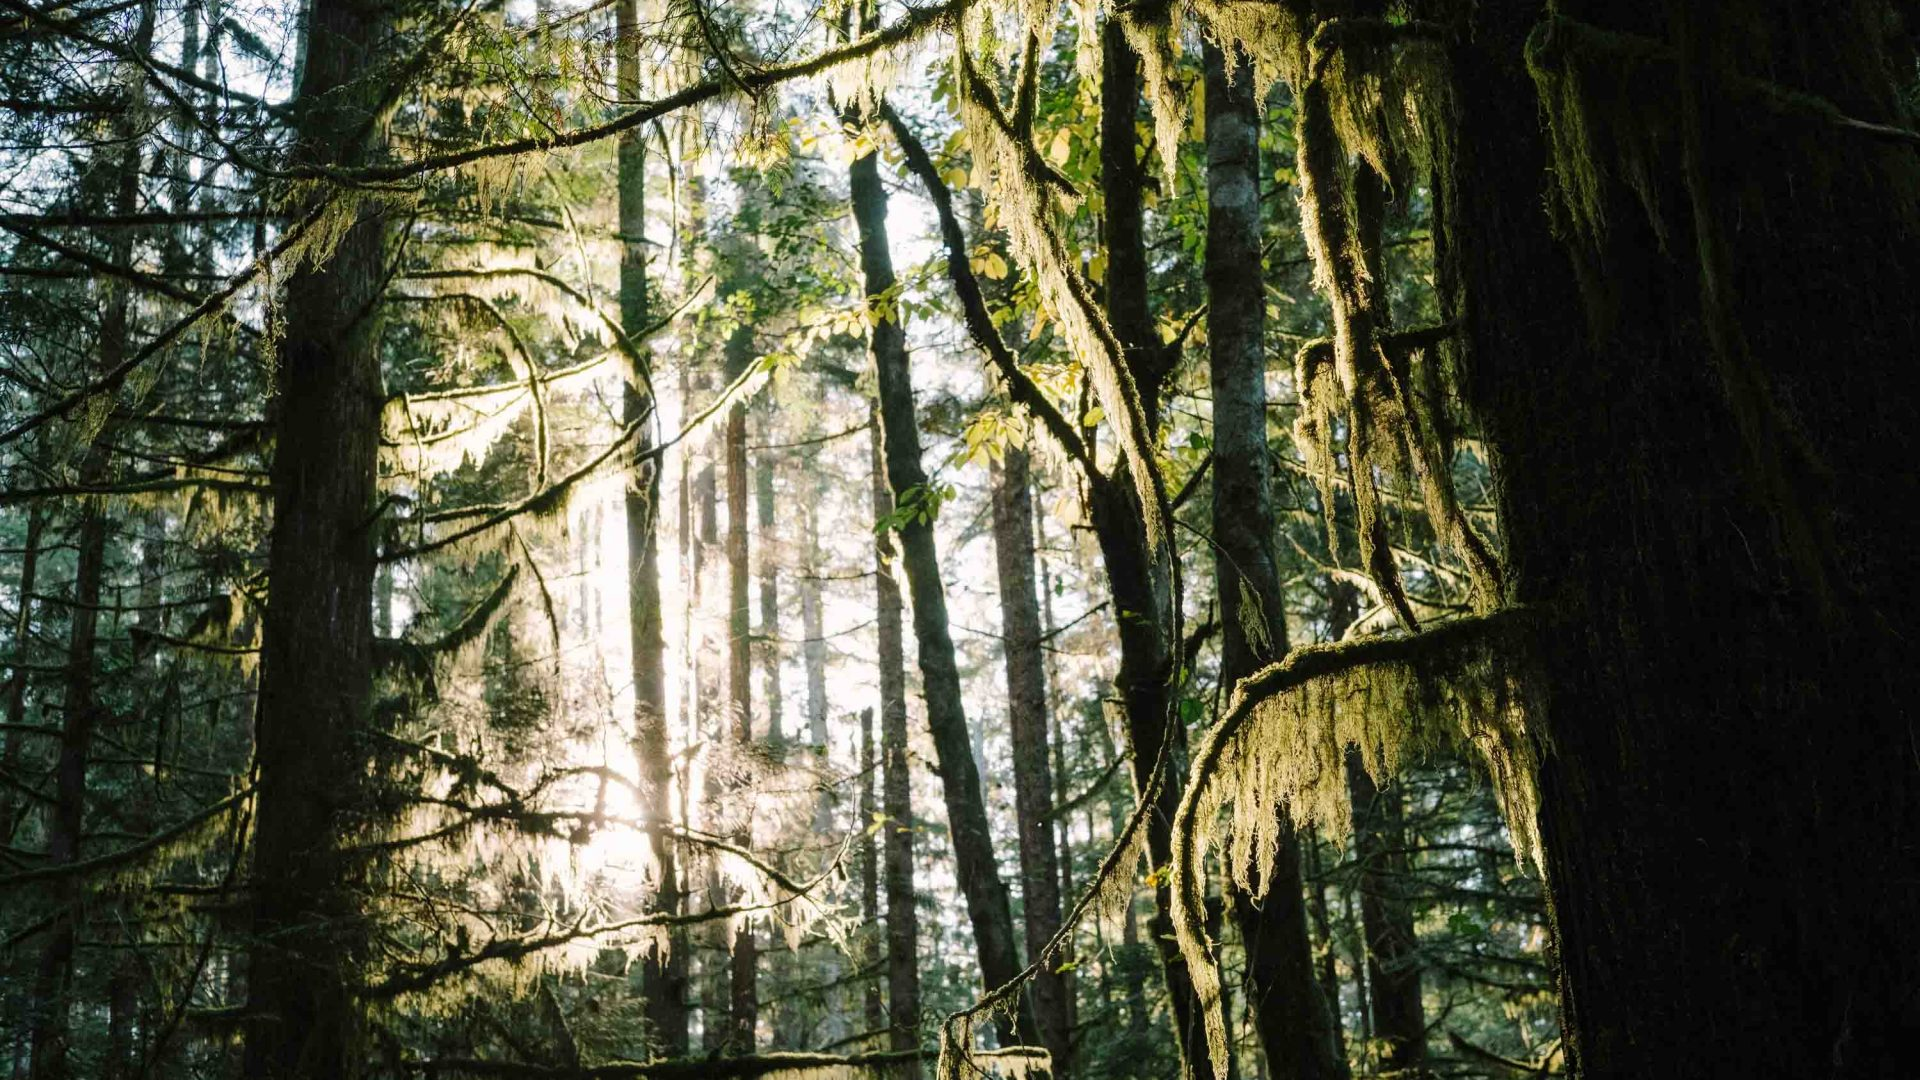 Dense green forest.